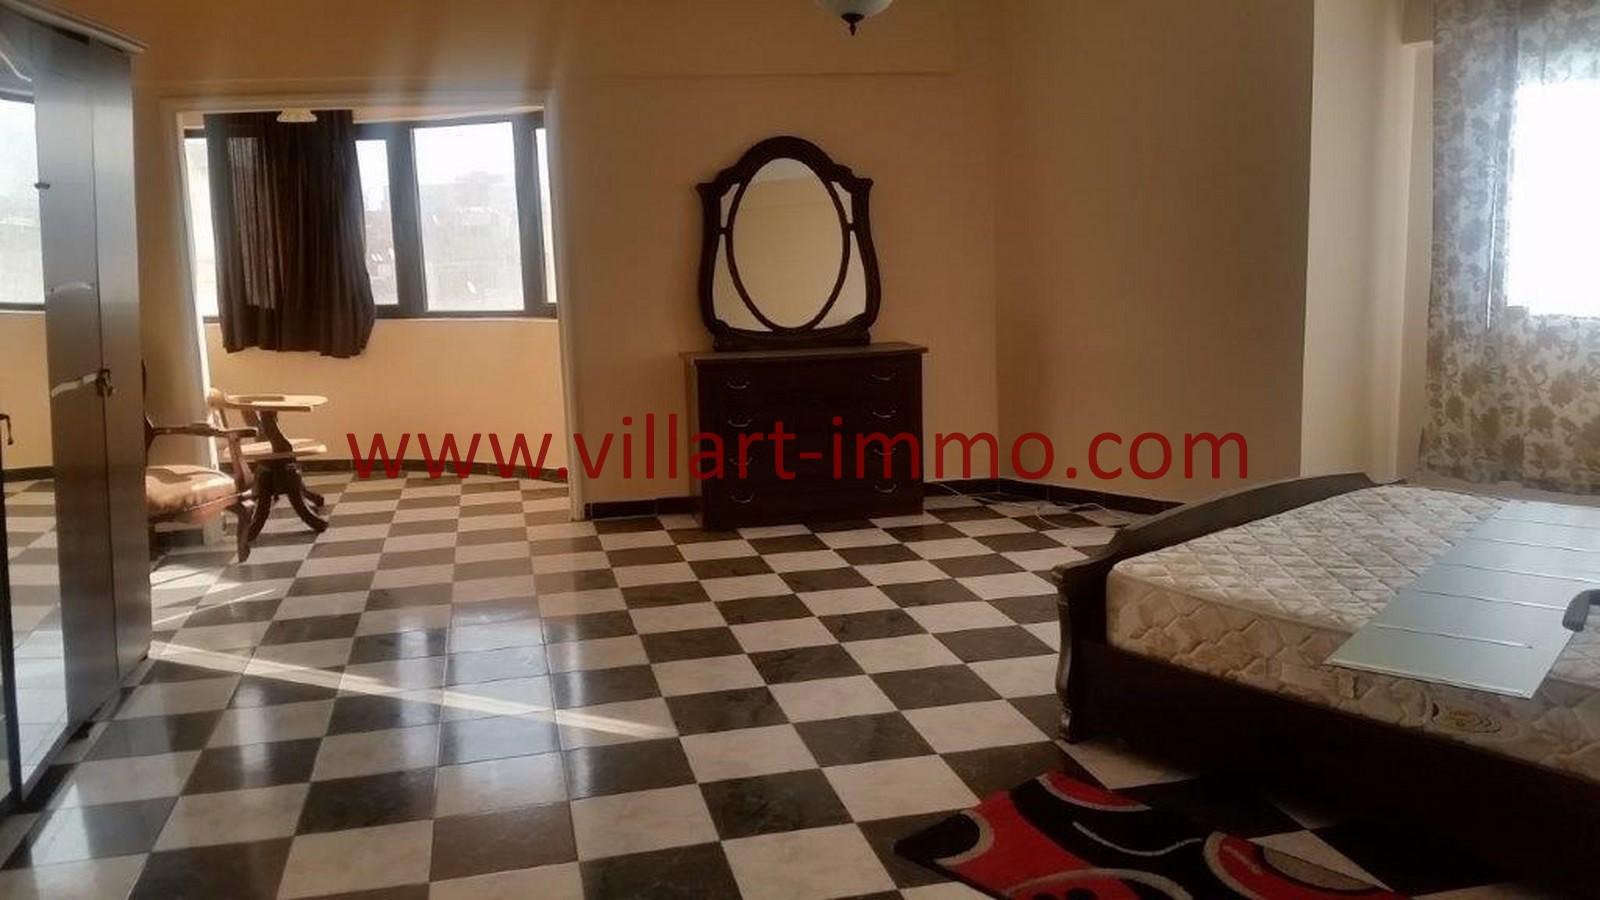 6-location-tanger-appartement-non-meublee-iberia-chambre-principale-2-l1013-villart-immo-agence-immobiliere